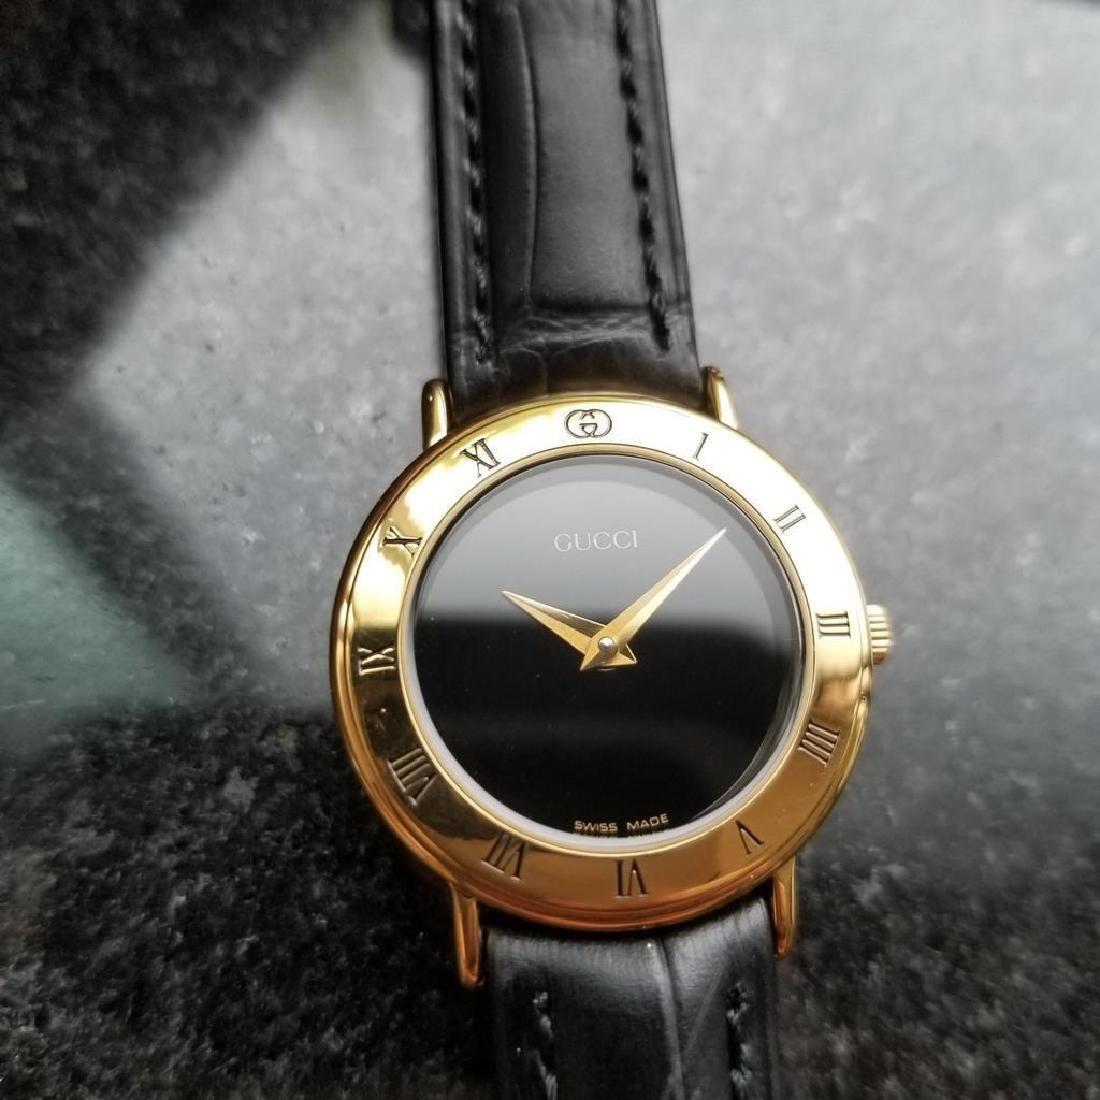 GUCCI Ladies Gold-Plated 3000.2.L Lux Swiss Dress Watch - 4